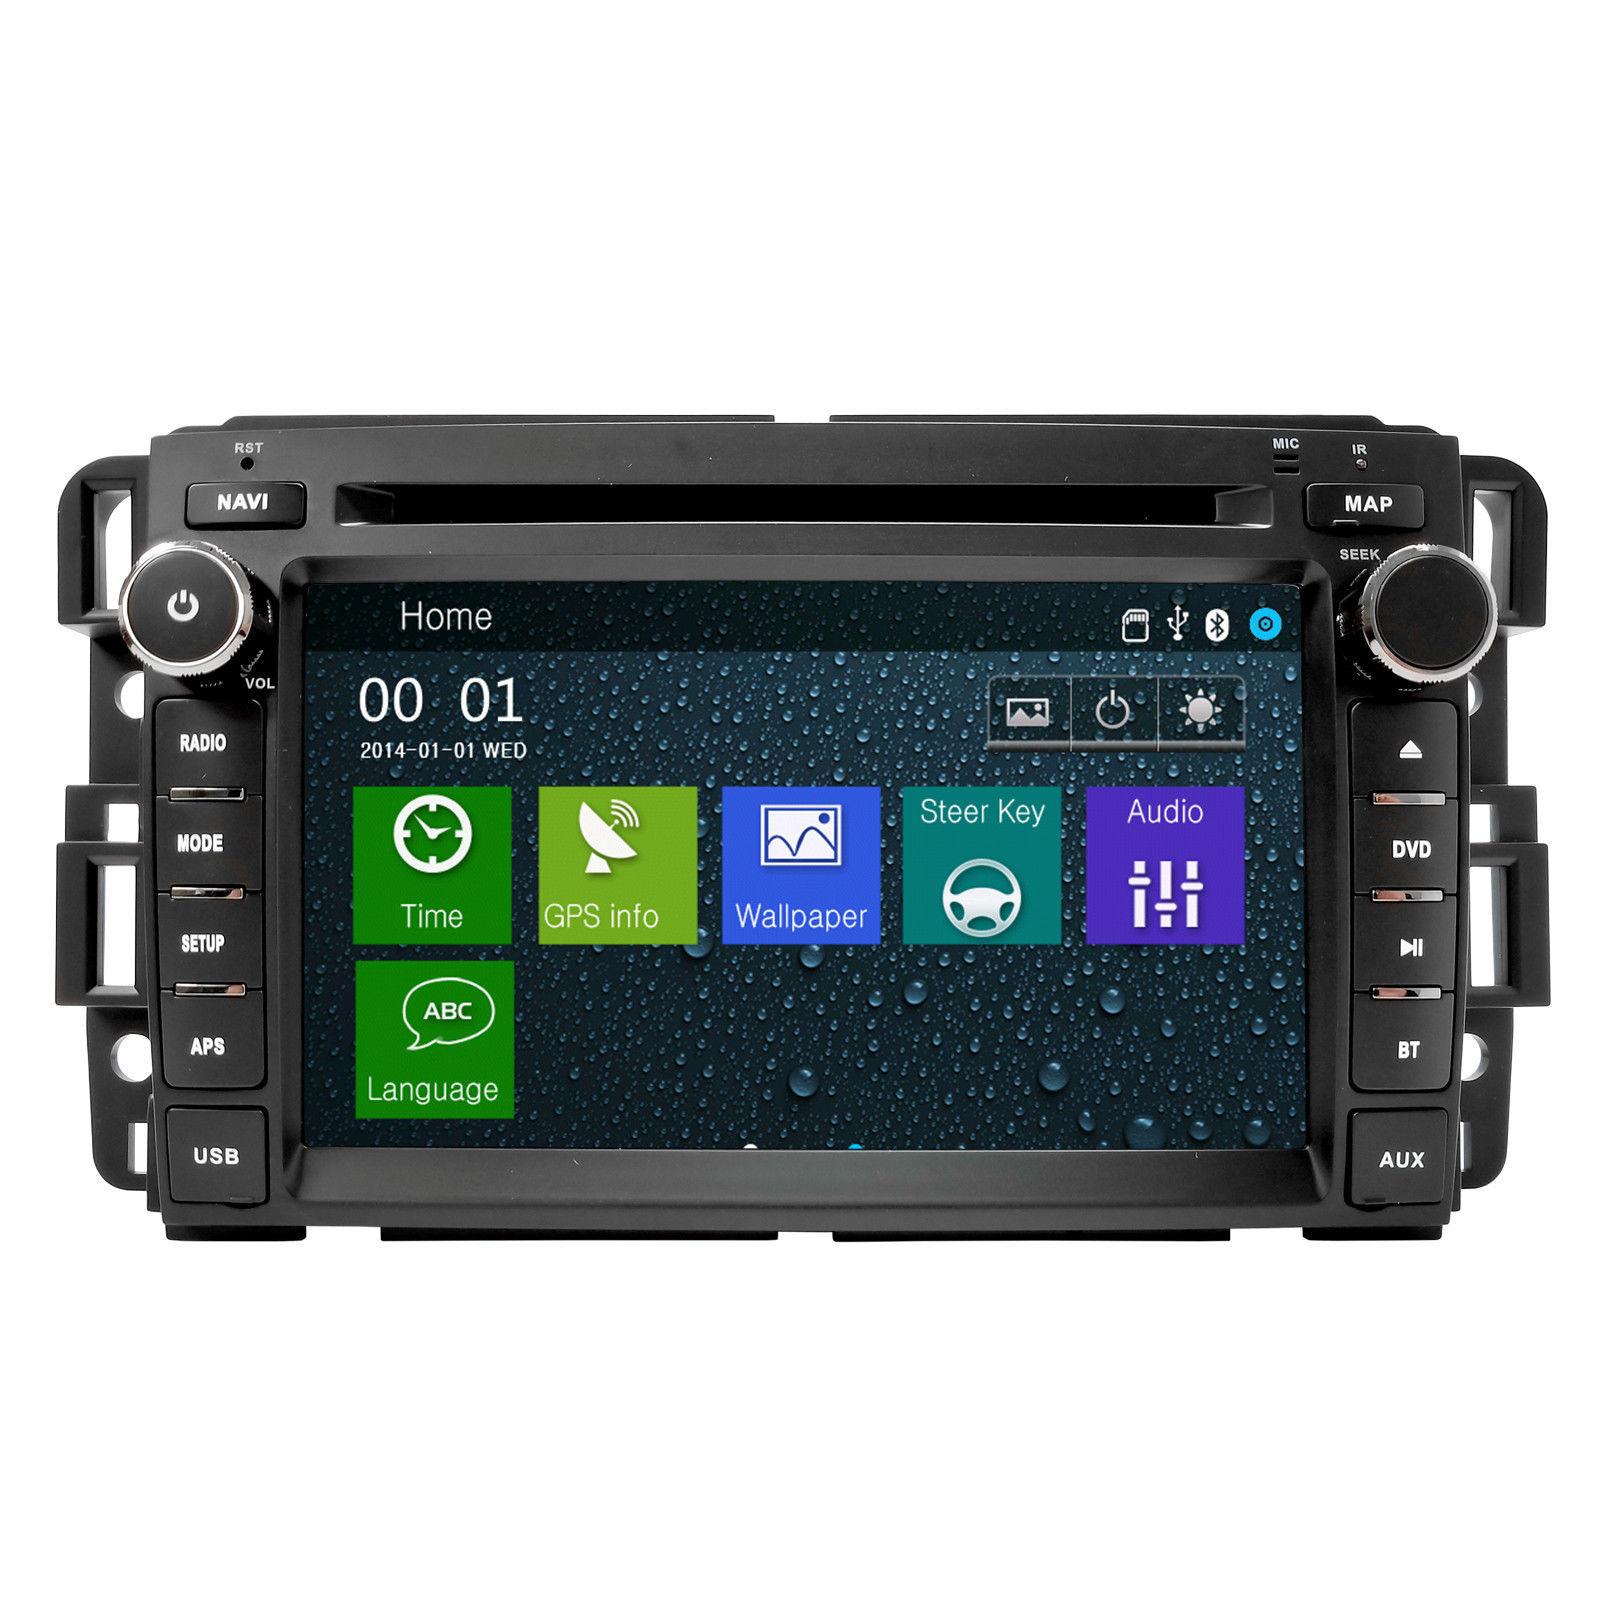 DVD Navigation Touchscreen Multimedia Radio for 2008 GMC Denali image 2